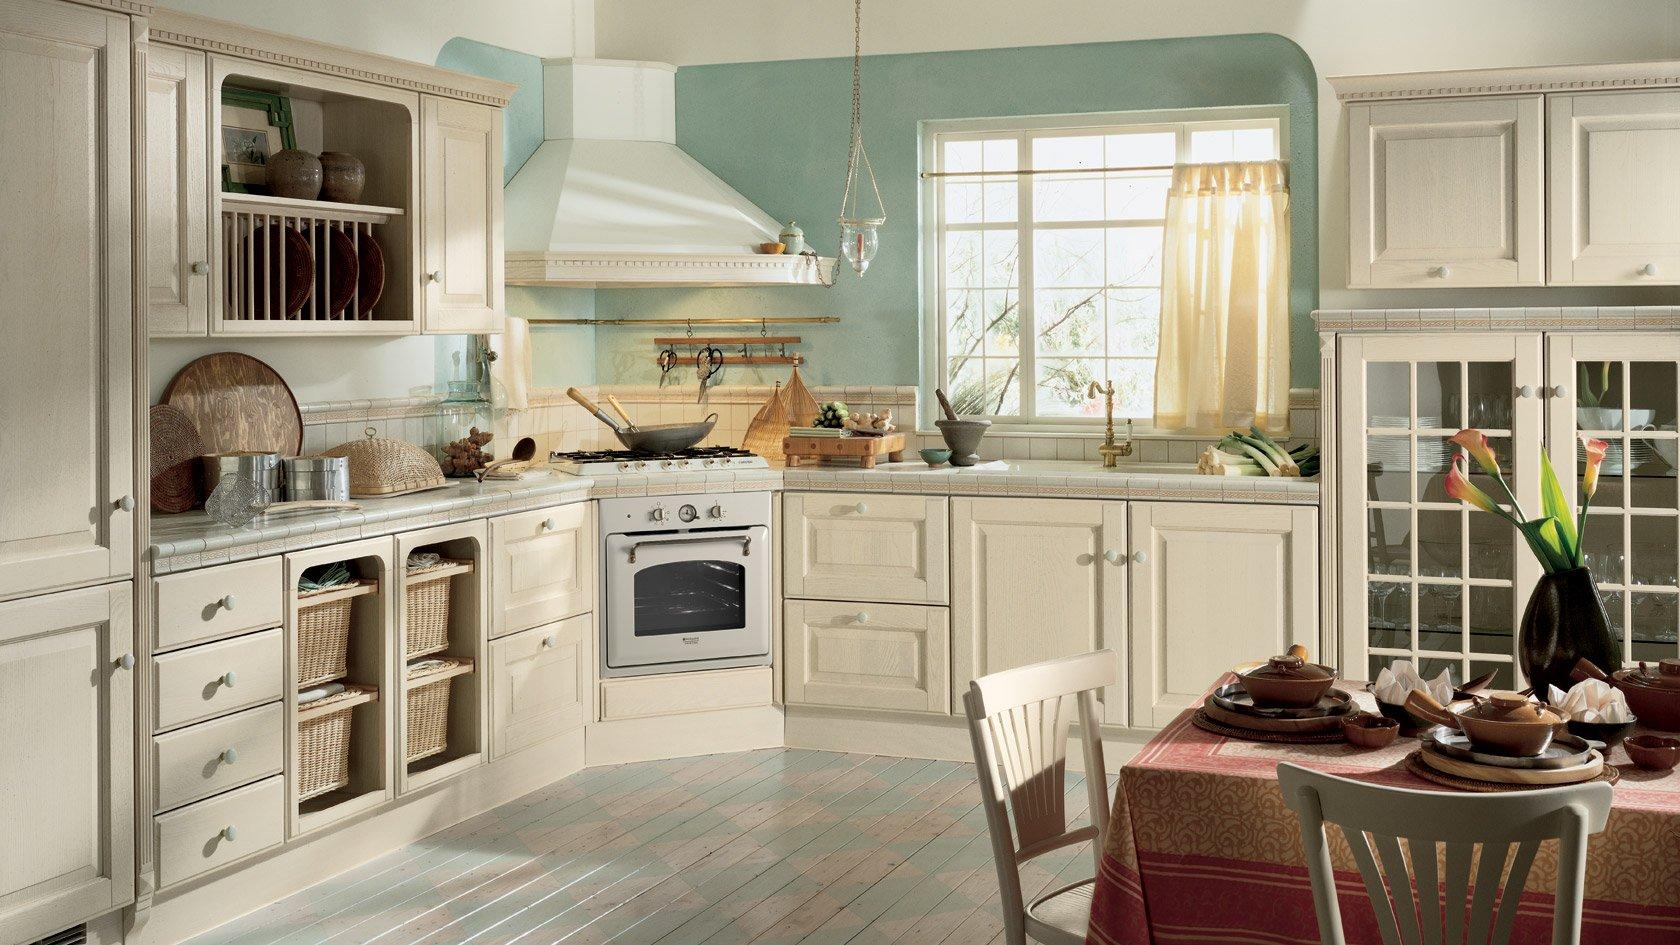 Cucina Scavolini Usata Napoli : Cucina a isola piccola. Cucina a ...